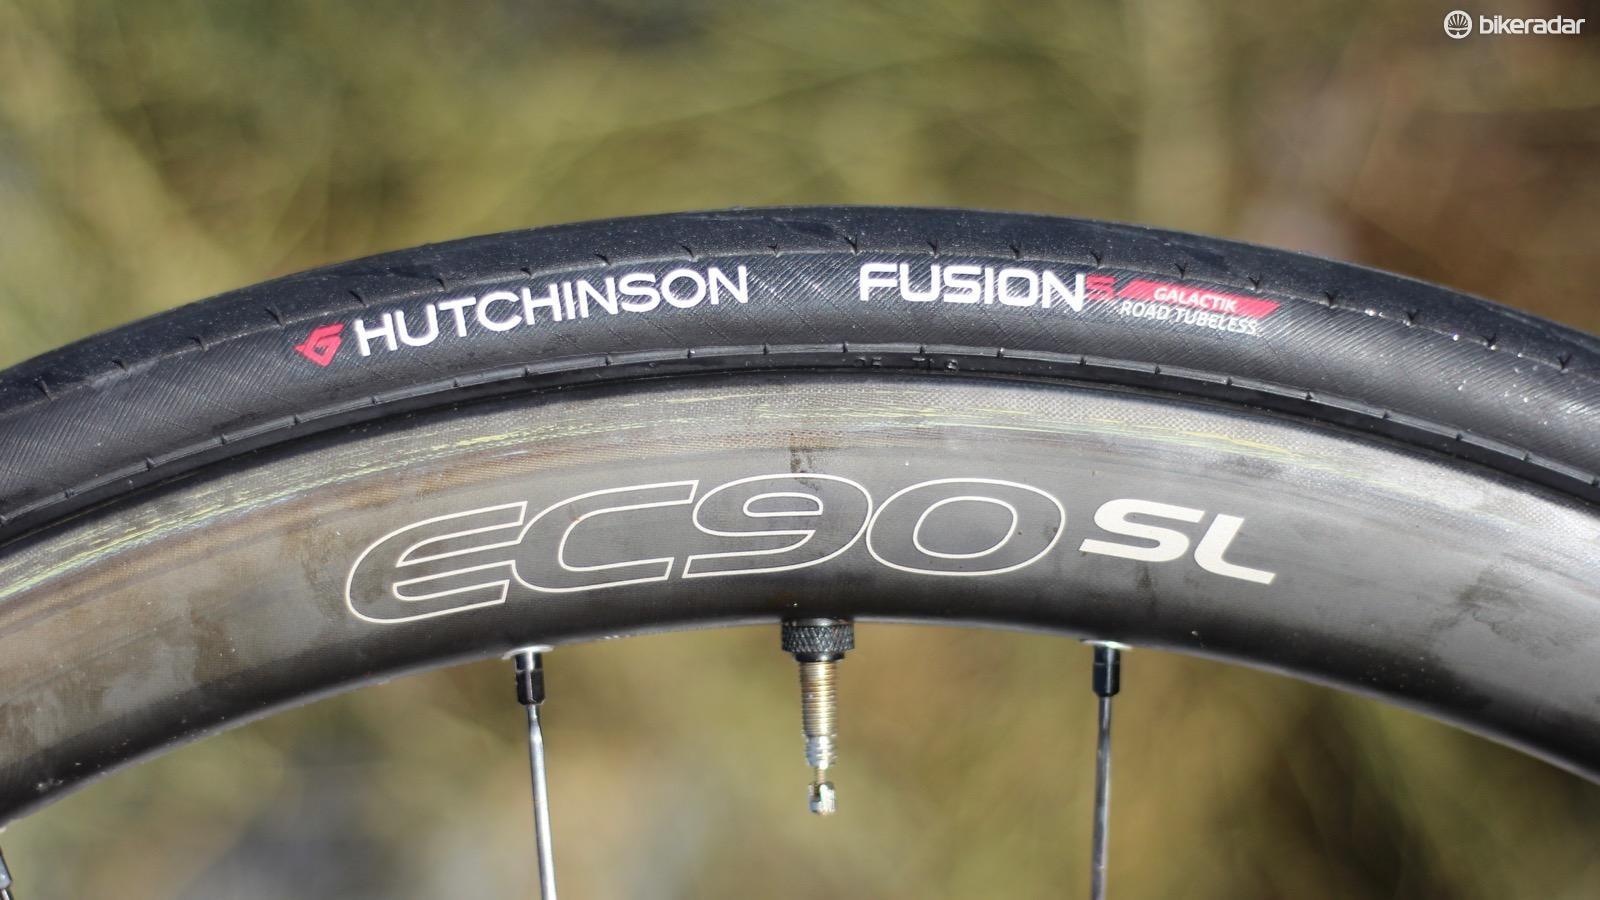 road-tire-test-19-1486070698711-1kc2wkl6365iq-98fcf62